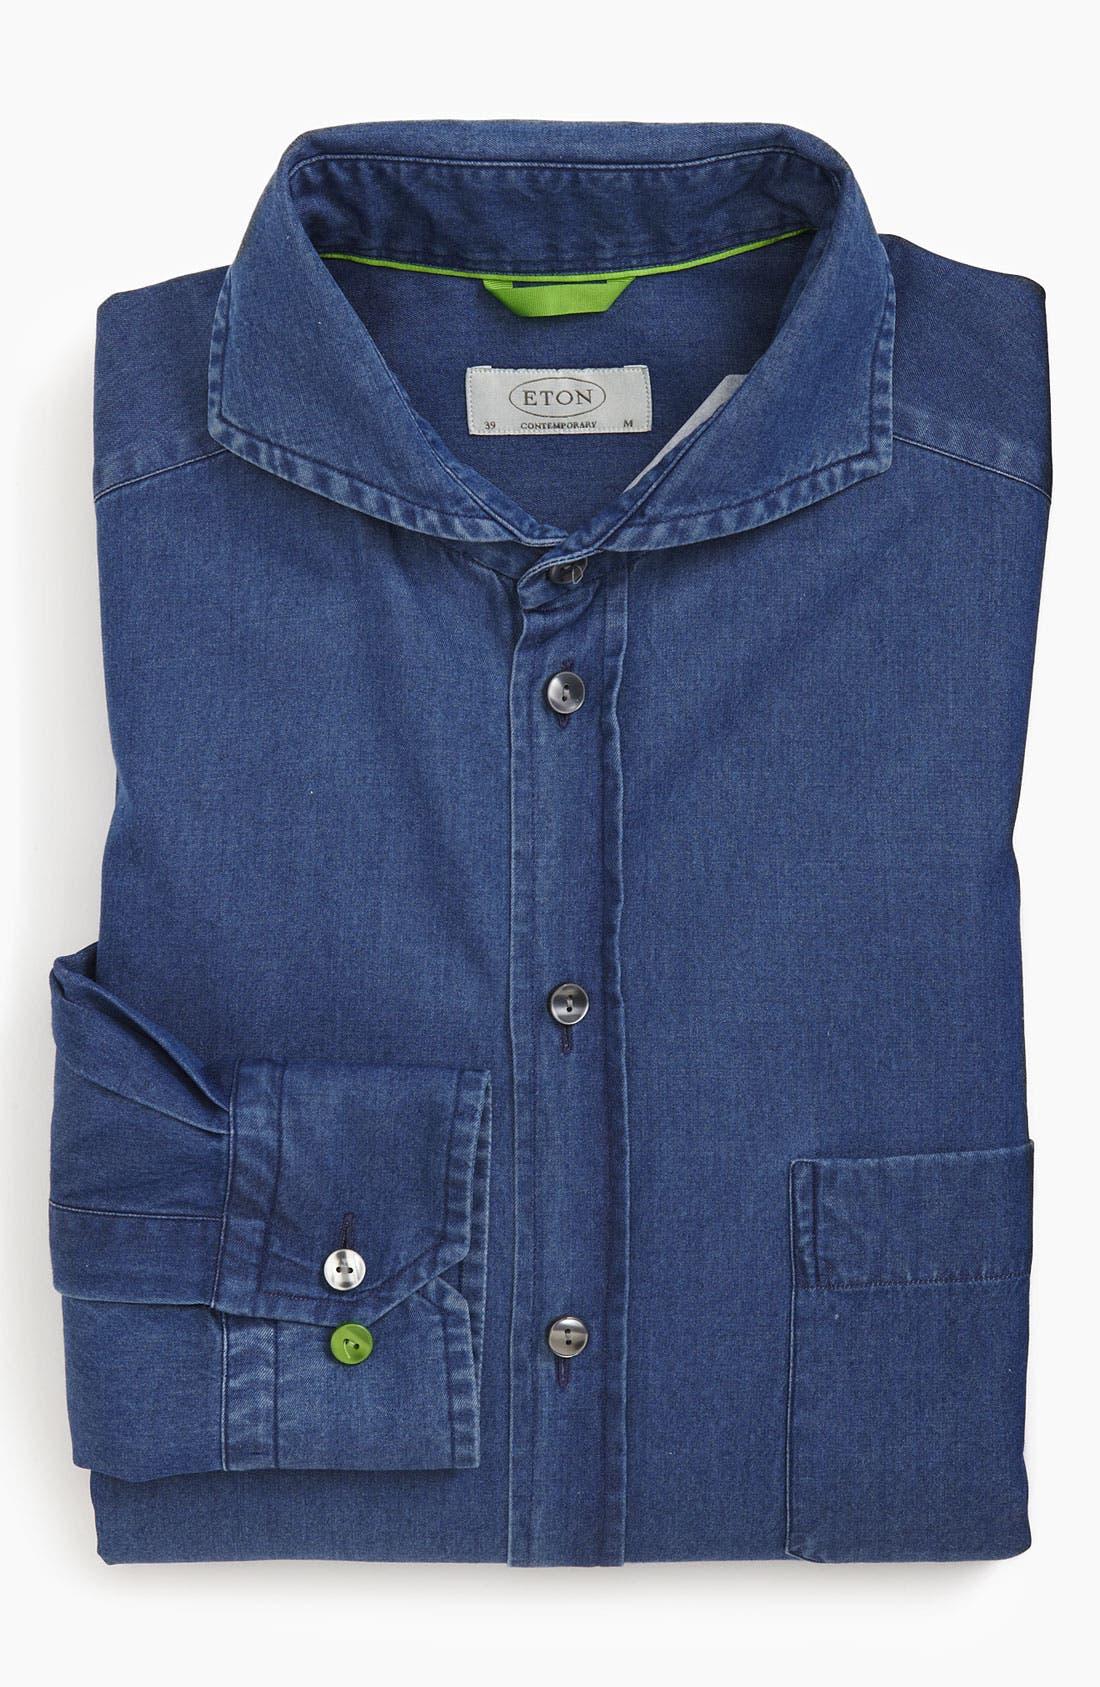 Main Image - Eton Contemporary Fit Denim Non-Iron Dress Shirt